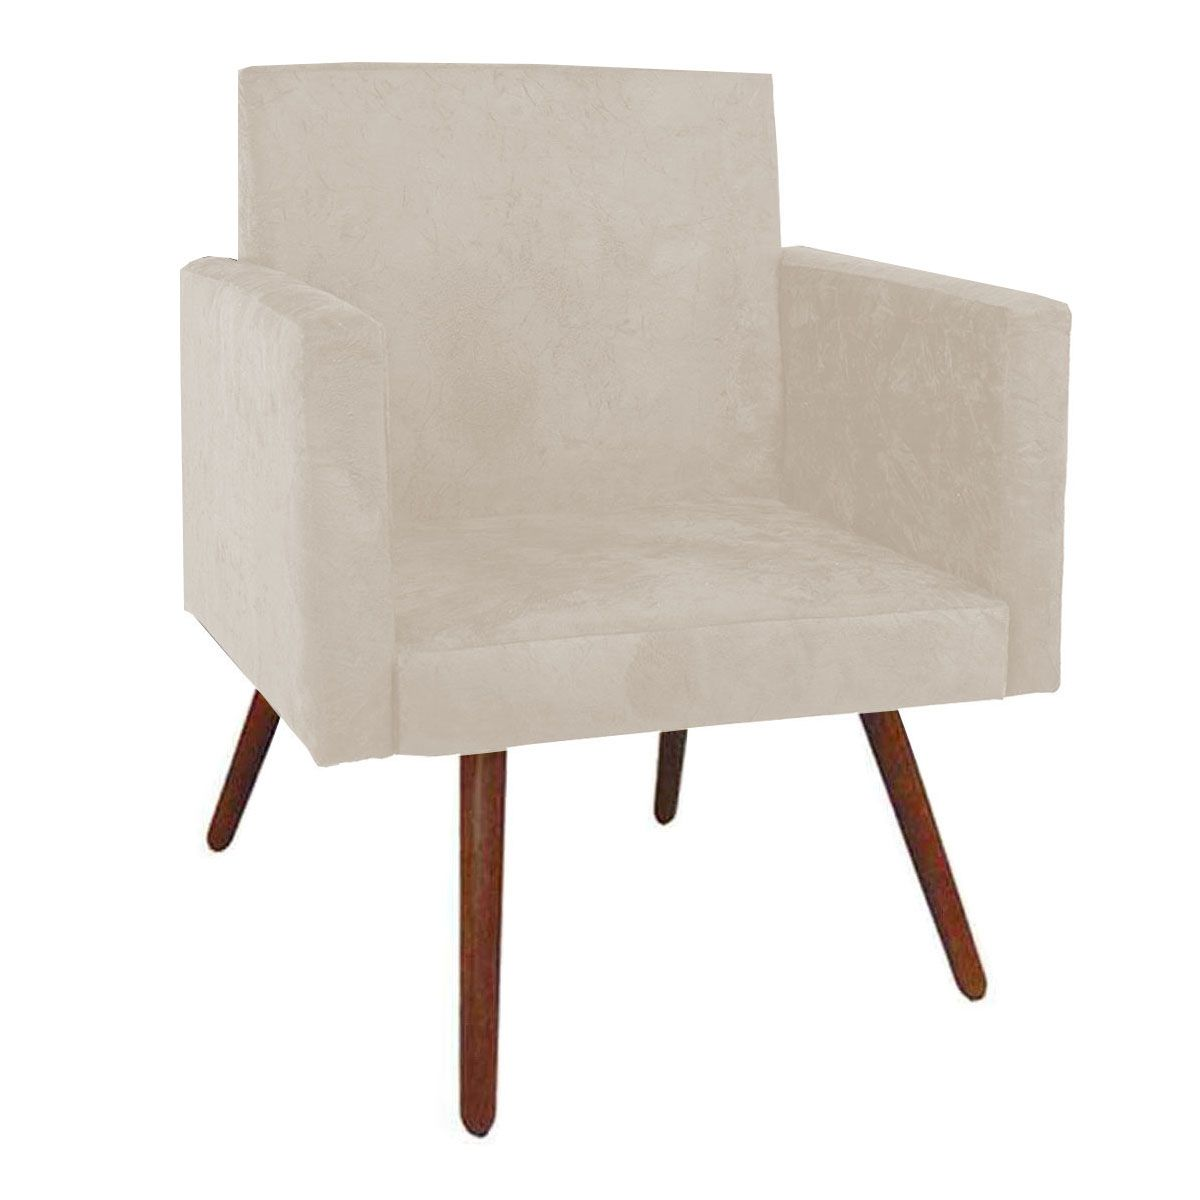 Poltrona Decorativa Nina Luxo Pés Palito Tecido Marfim